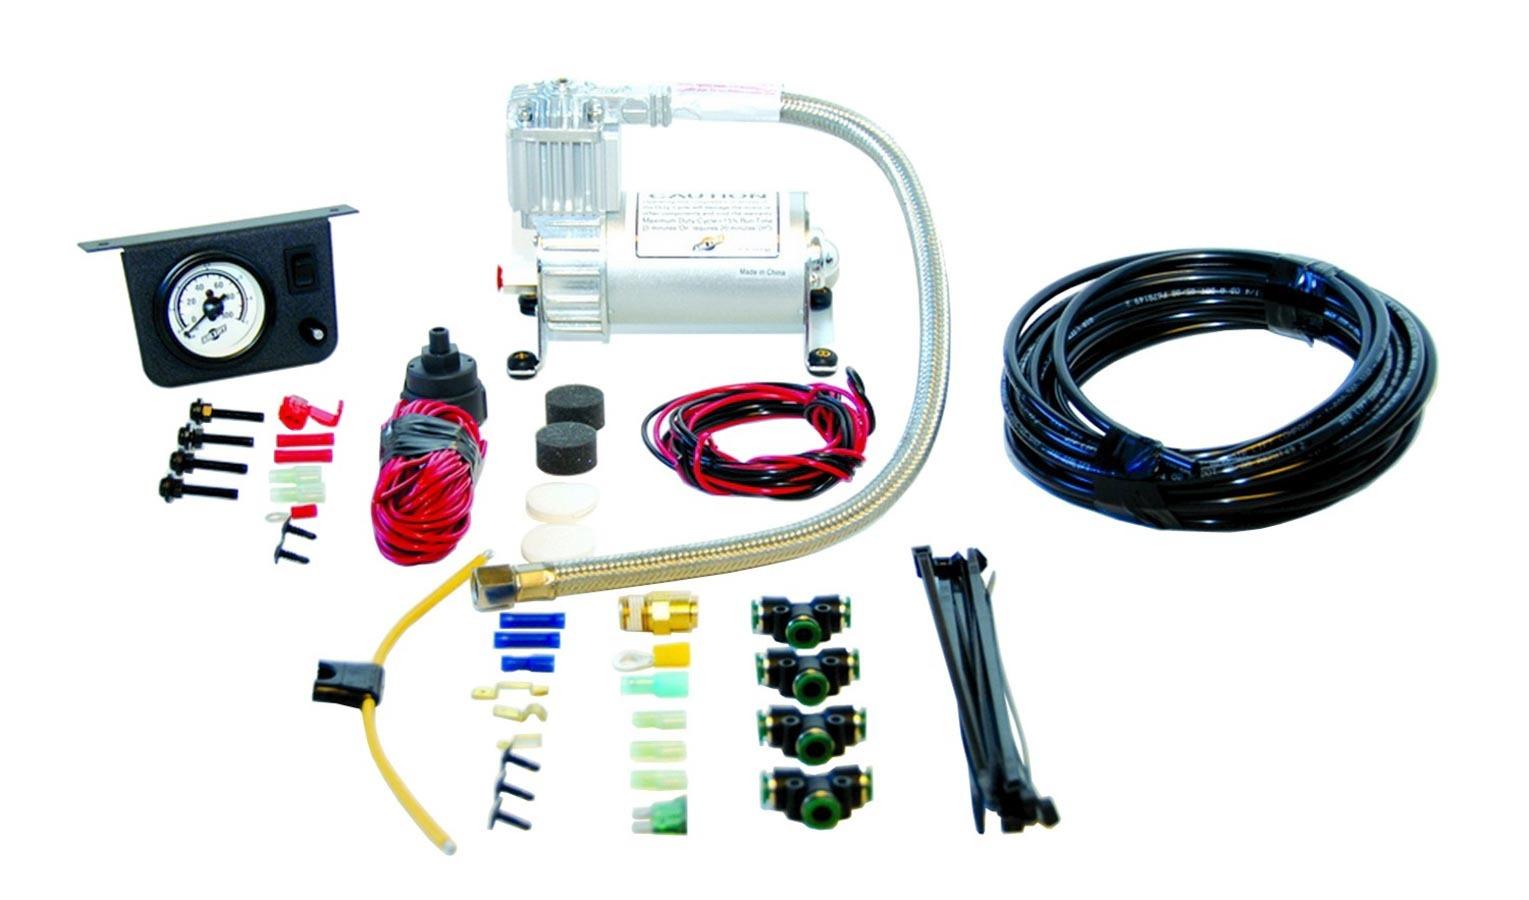 Air Lift 25655 Air Compressor, Load Controller I, Suspension, 100 psi Max, 12V, Single Gauge, Controls / Pressure Sensor, Airlift Air Spring Kits, Kit